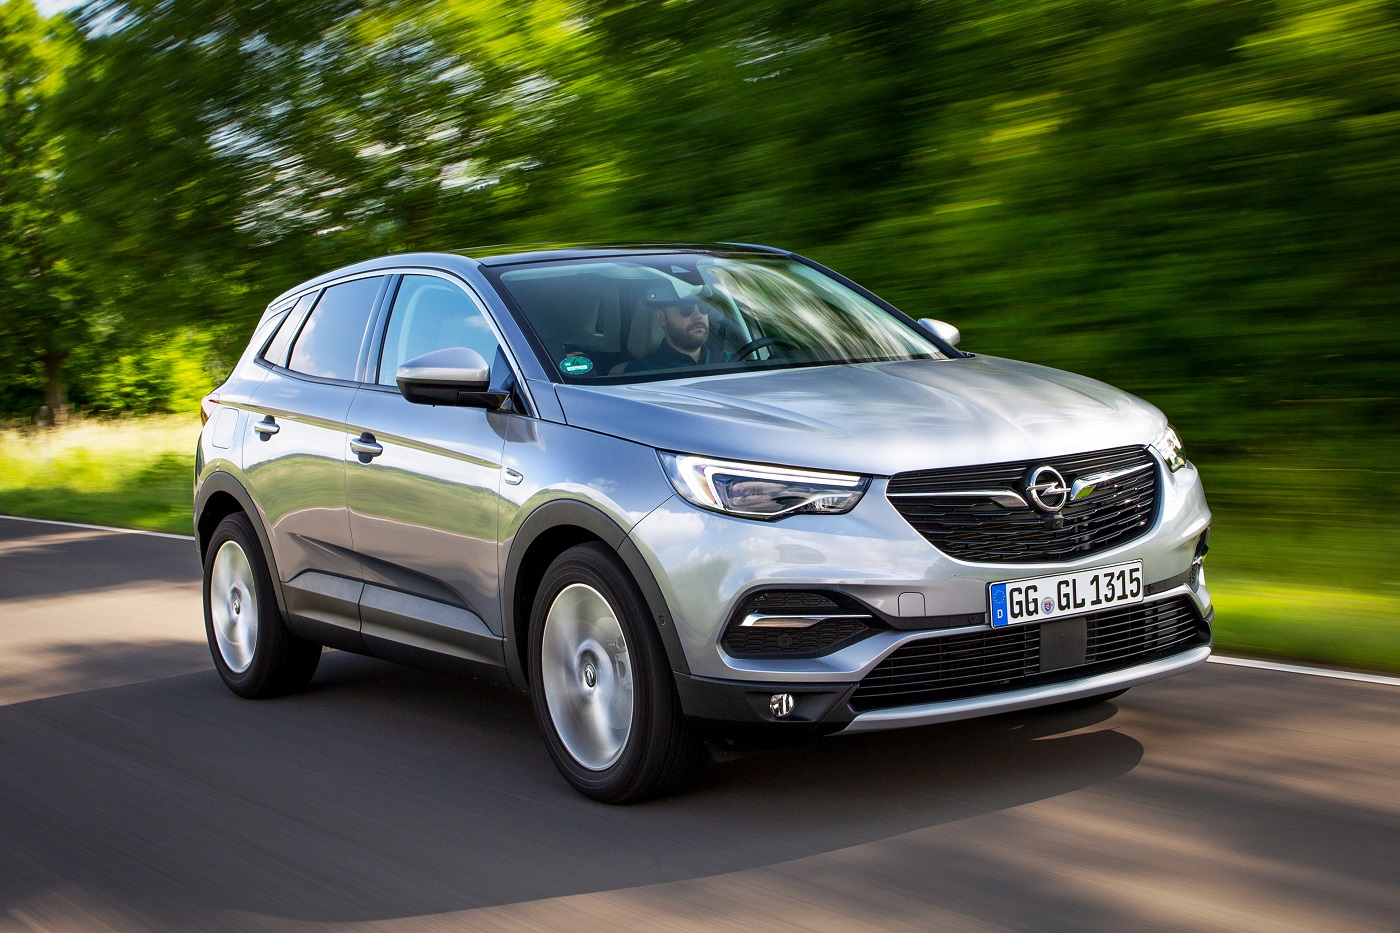 Бренд Opel объявляет о старте специального ценового предложения на SUV-флагман Opel Grandland X